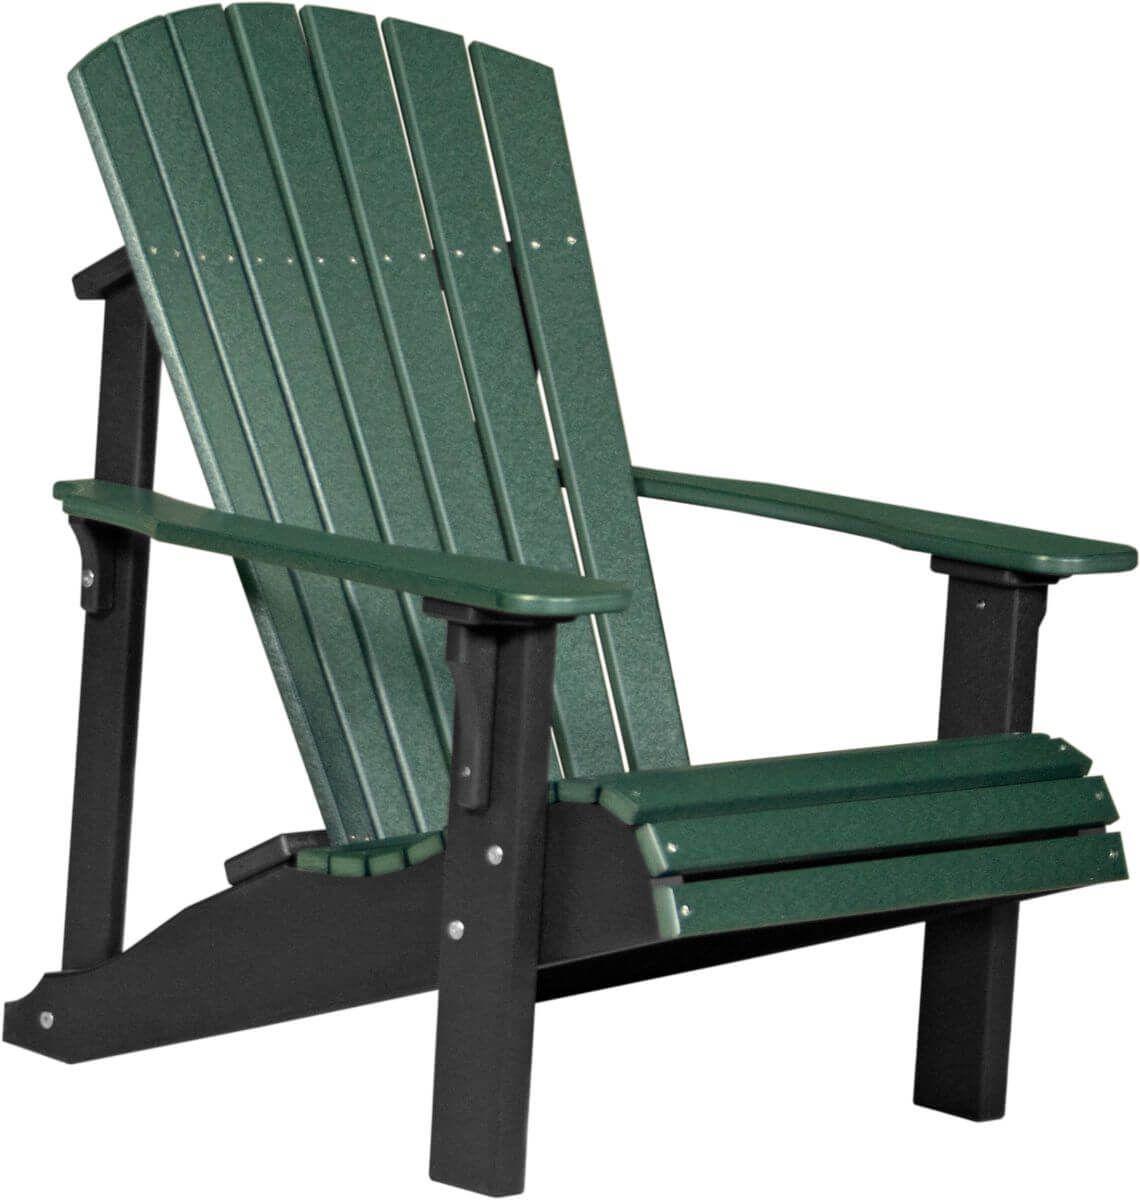 Green and Black Rockaway Adirondack Chair